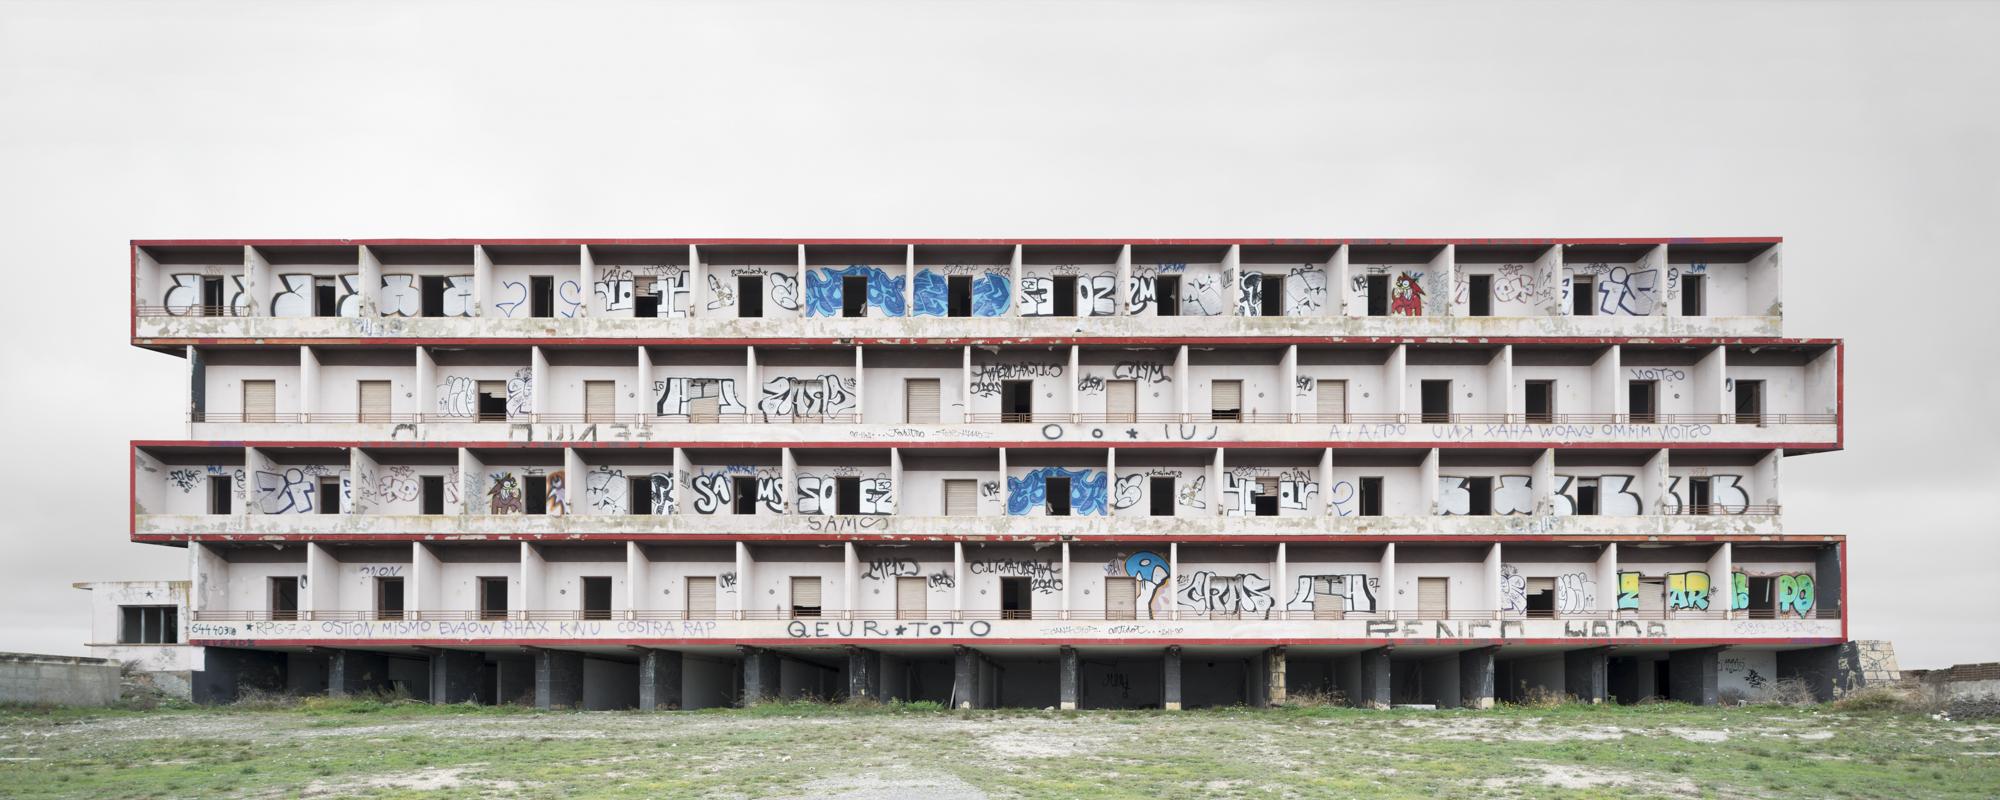 for sale - AVAILABLE NOWHERE - cesar azcarate, fotografia